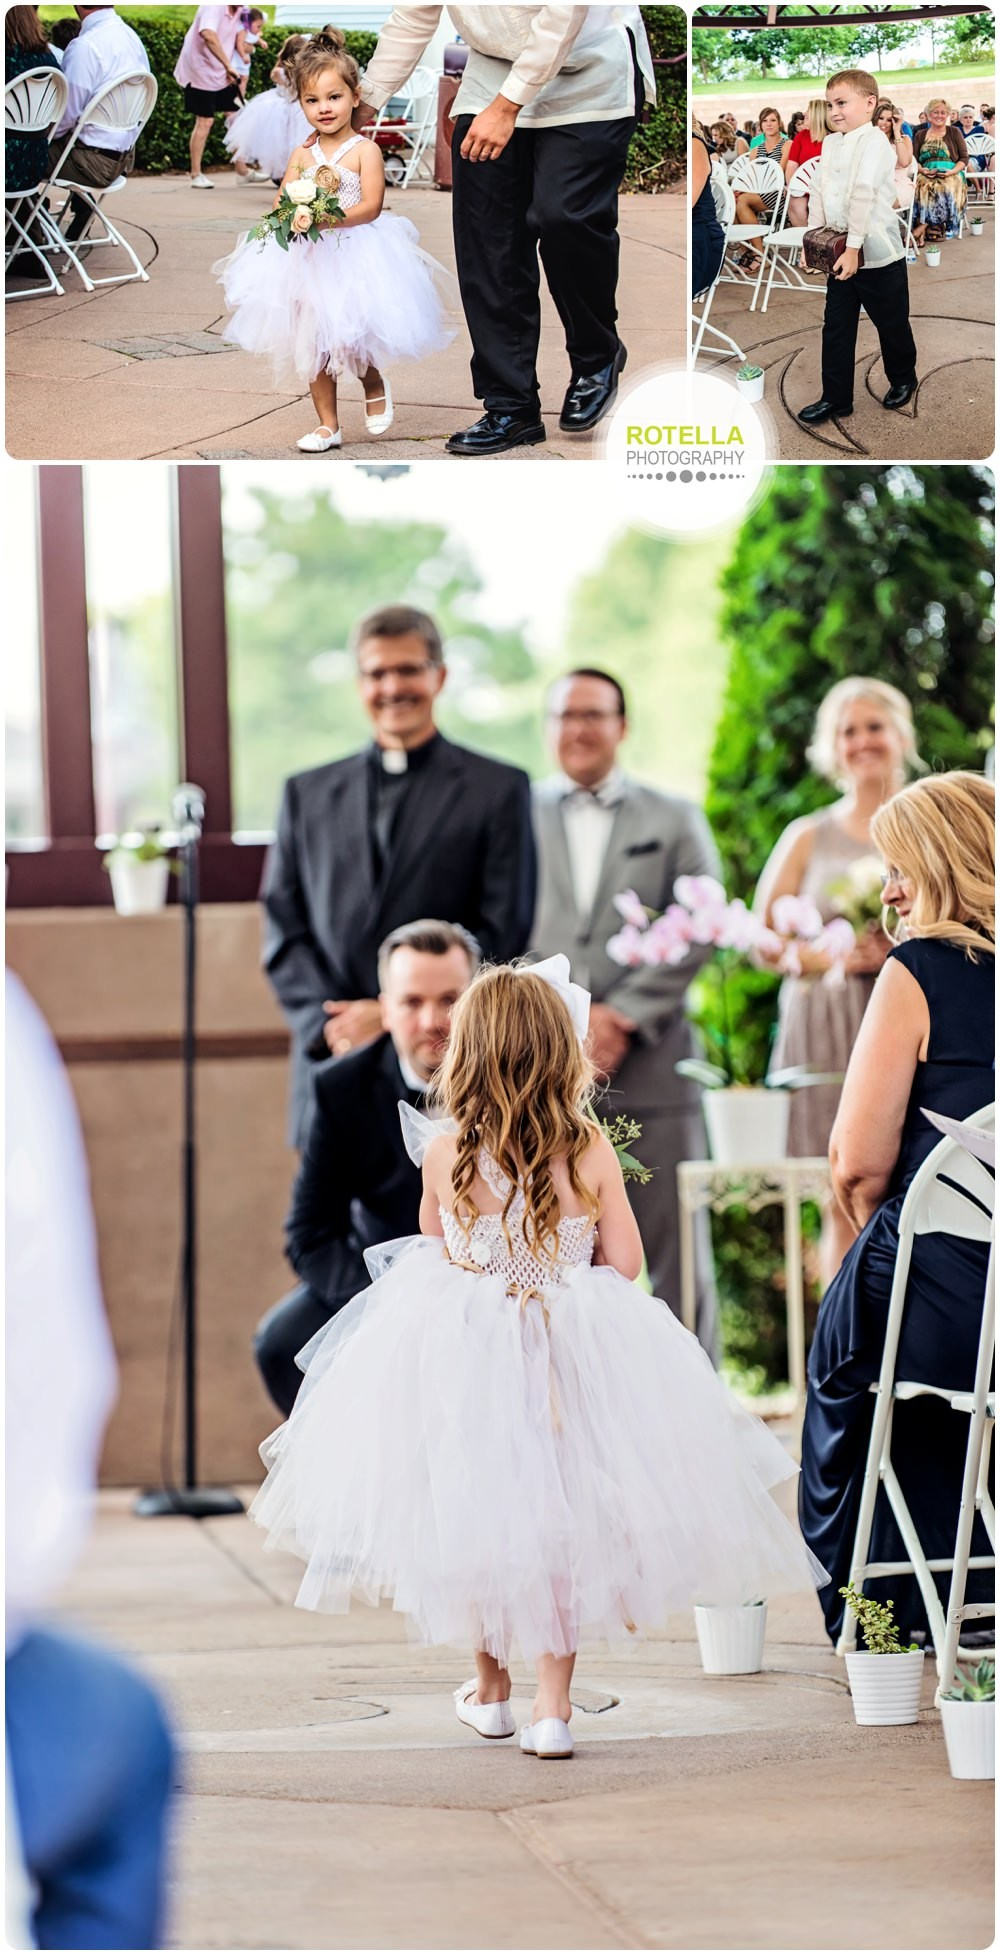 MELANIE-DEREK-MINNESOTA-WEDDING-PHOTOGRAPHY-ROTELLA-PHOTOGRAPHY_2015-09